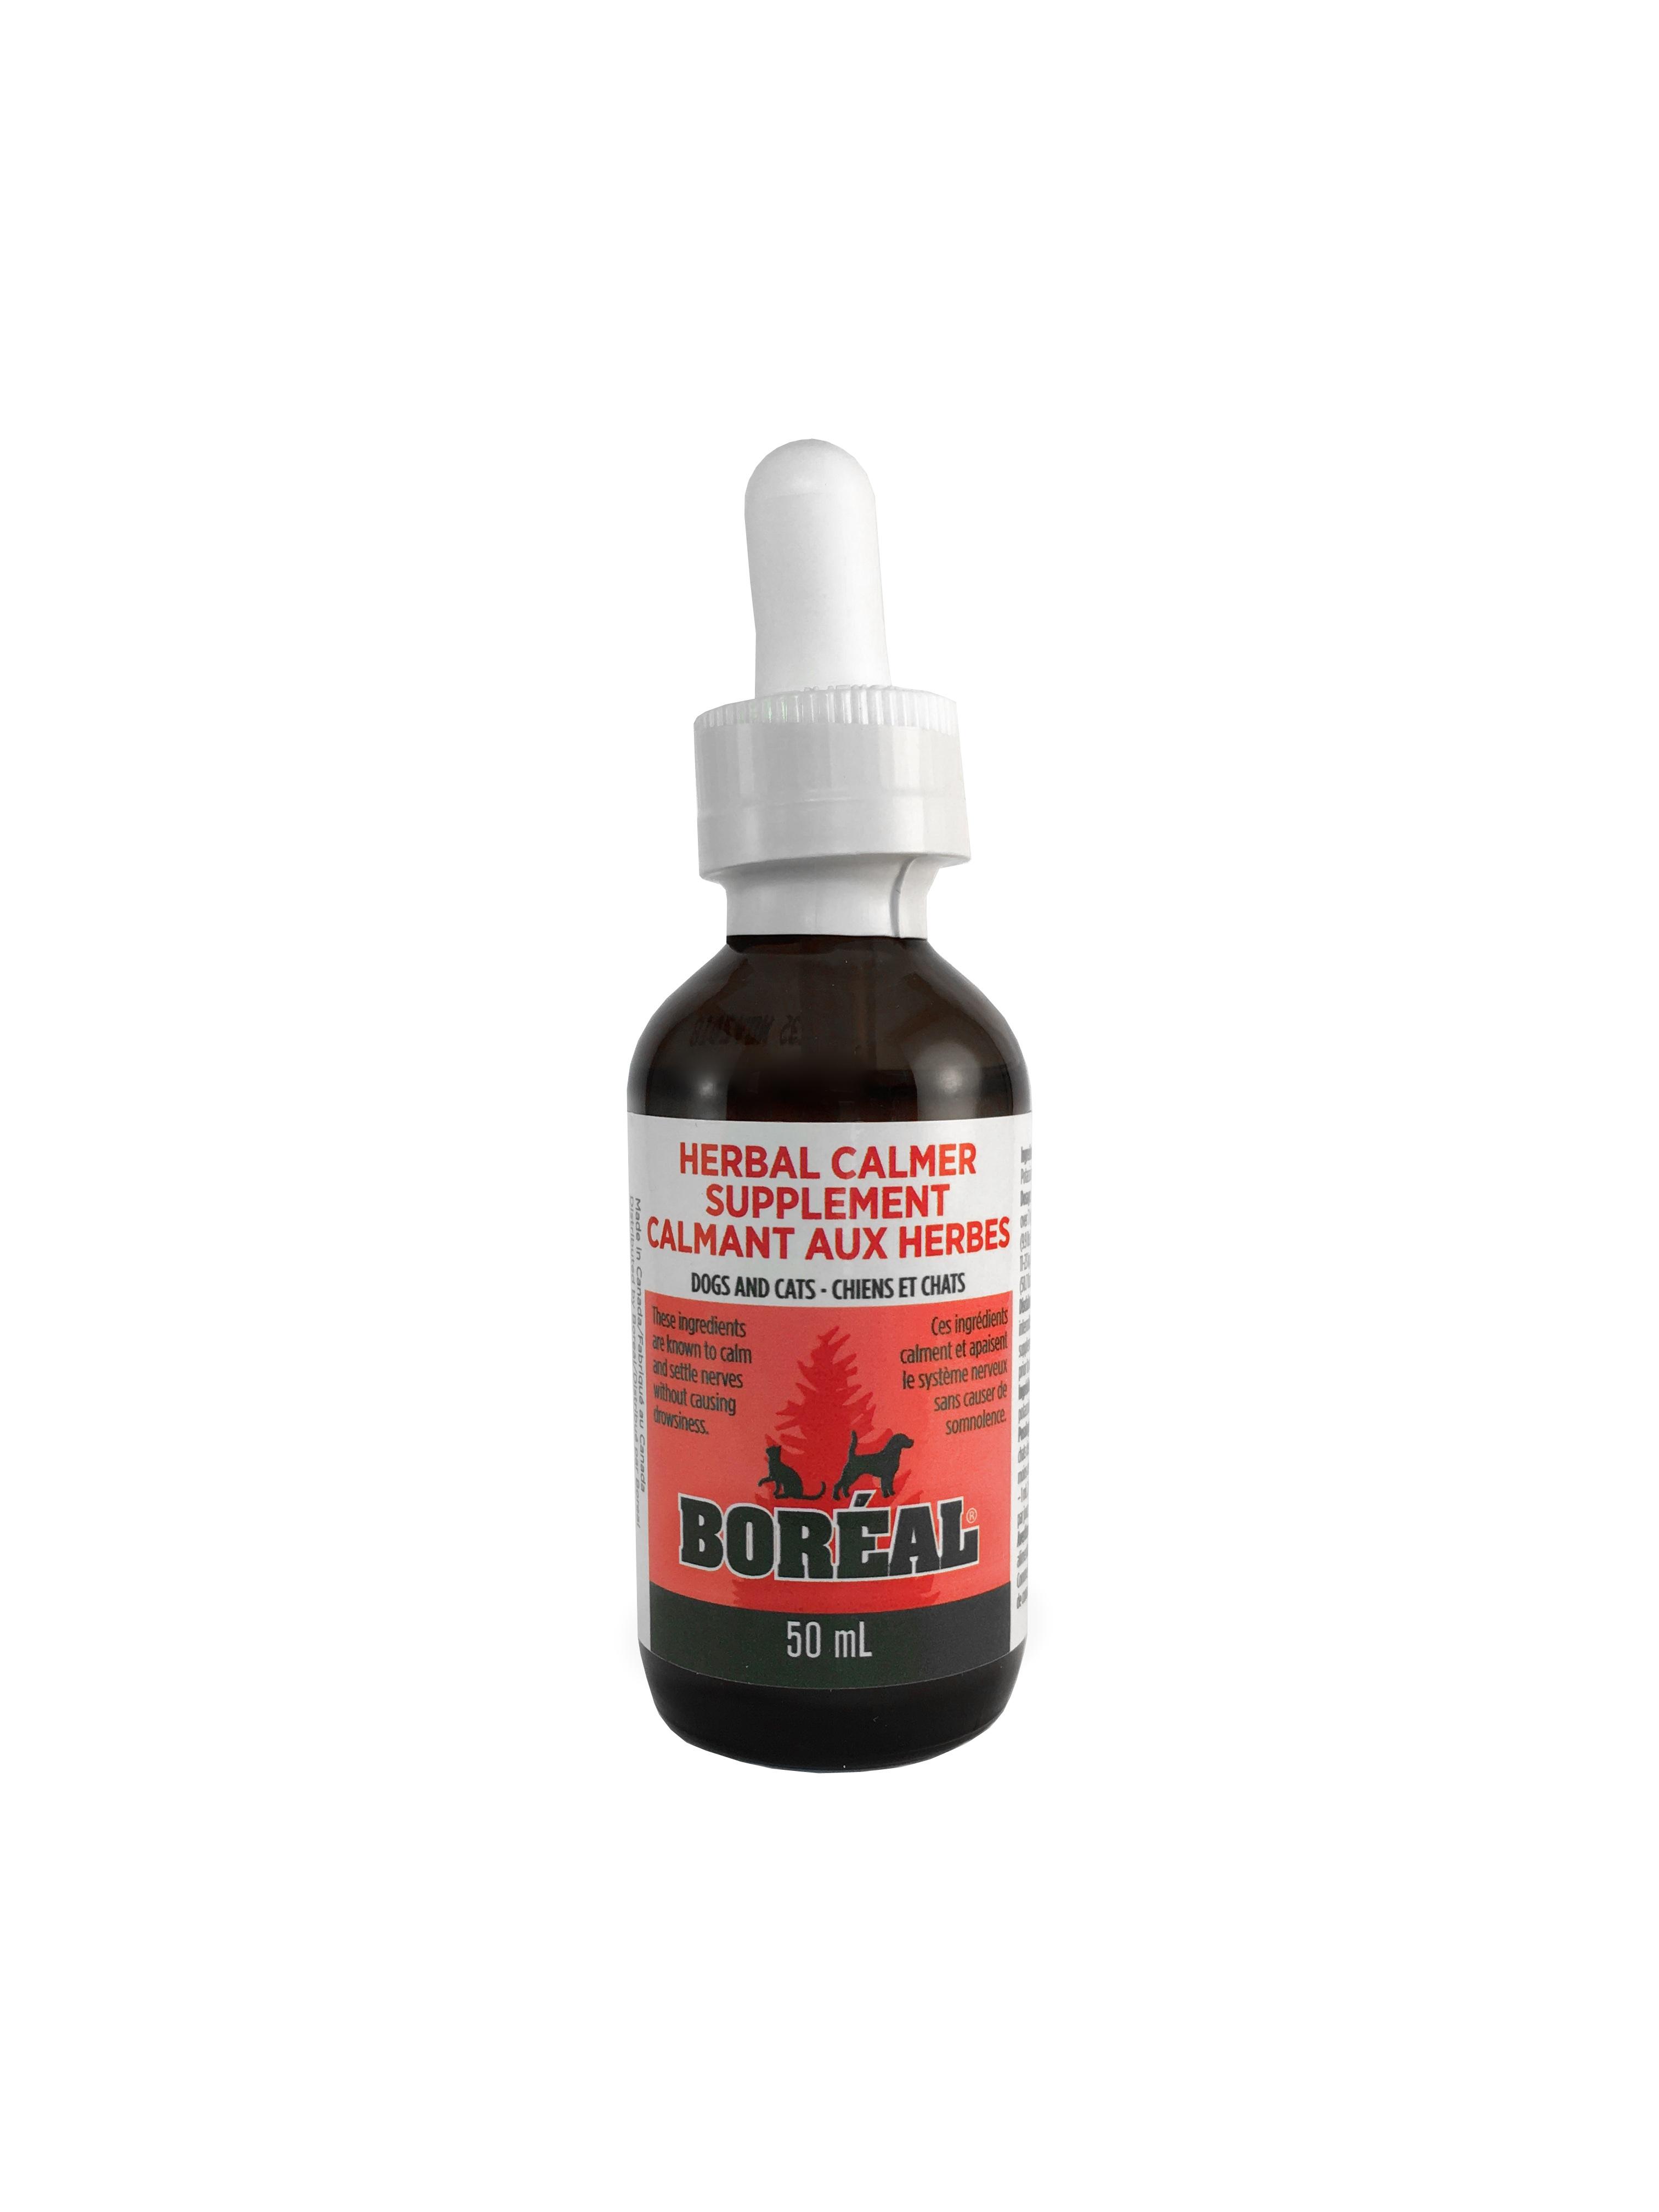 Herbal Calmer